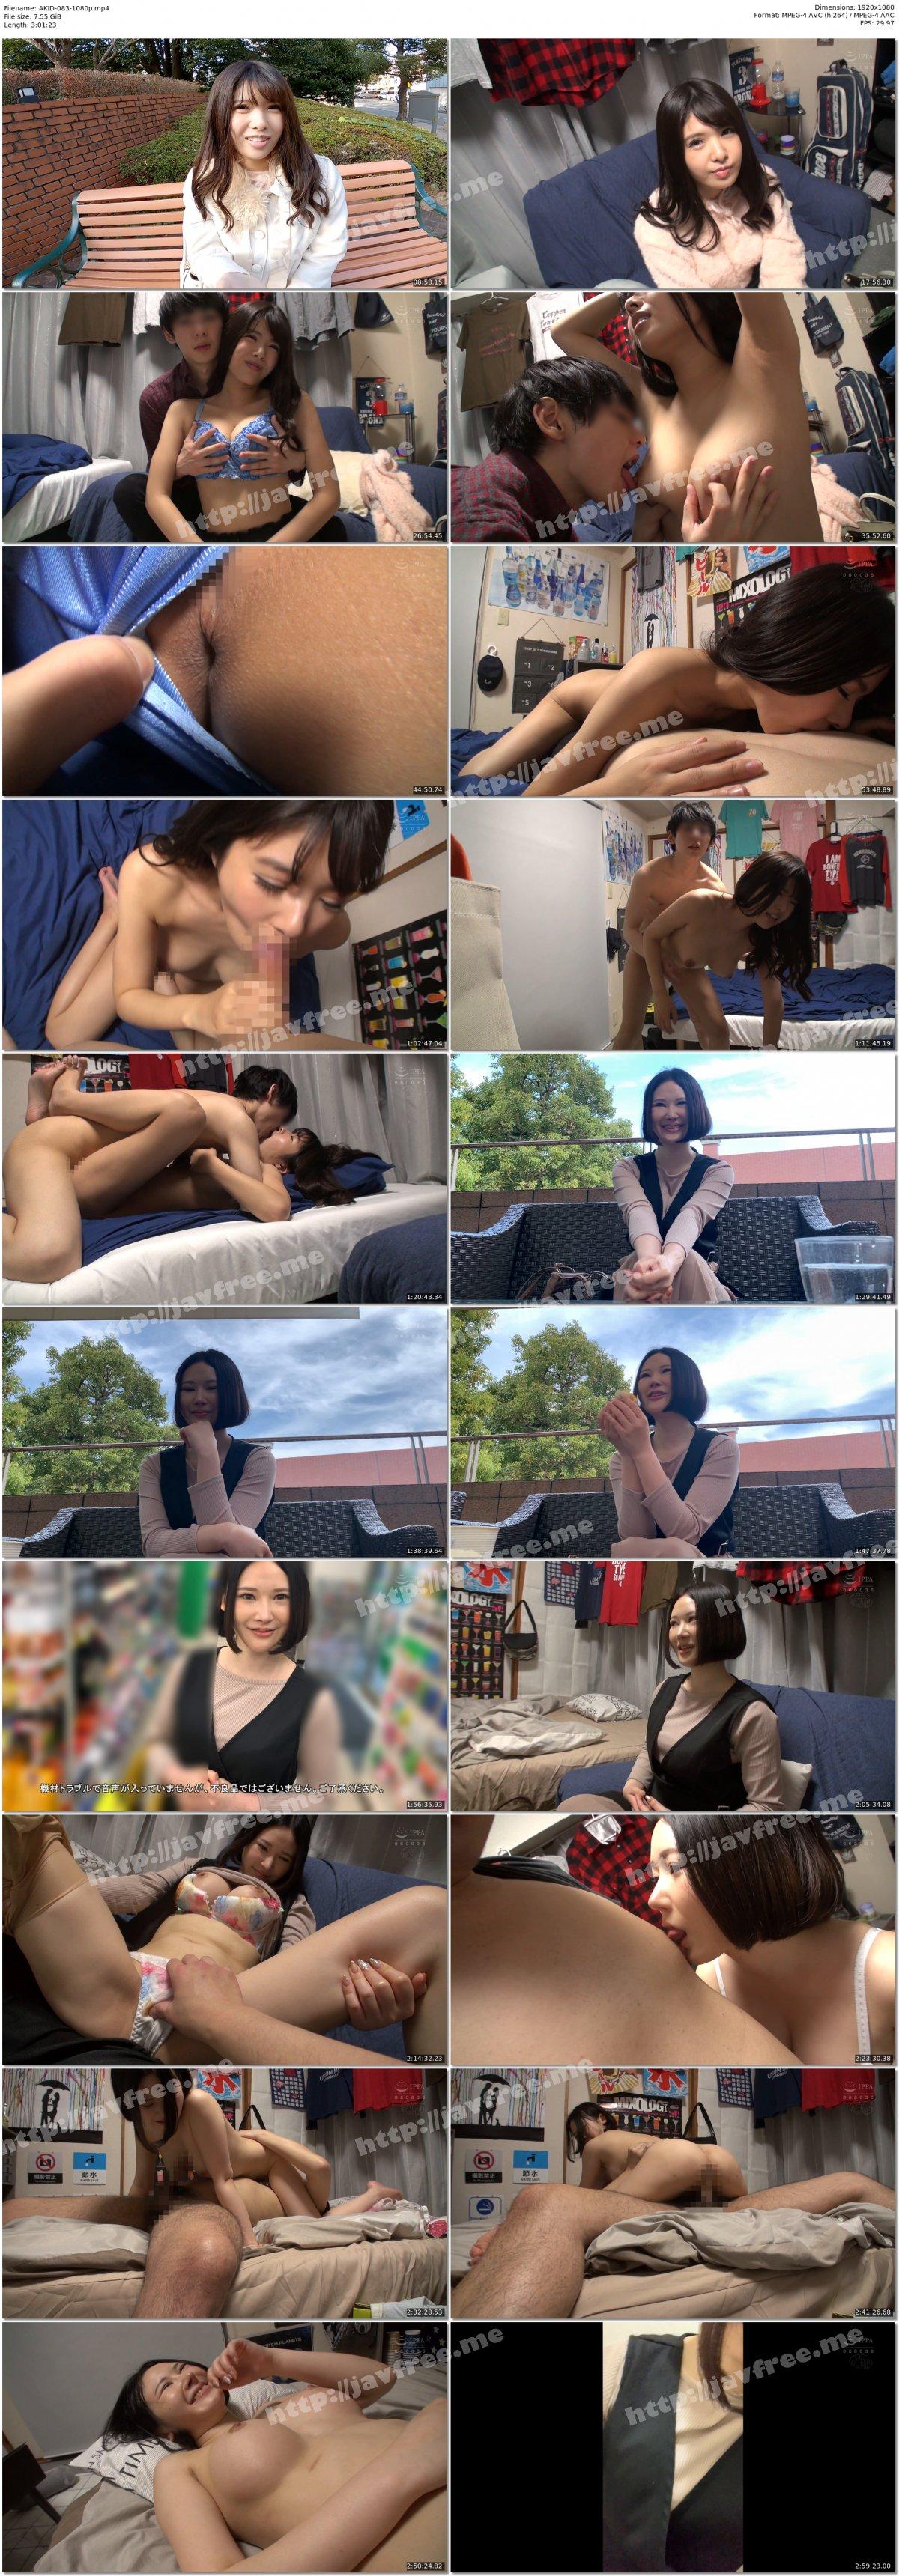 [HD][AKID-083] @えち活はじめました!!#お持ち帰り vol.2 - image AKID-083-1080p on https://javfree.me